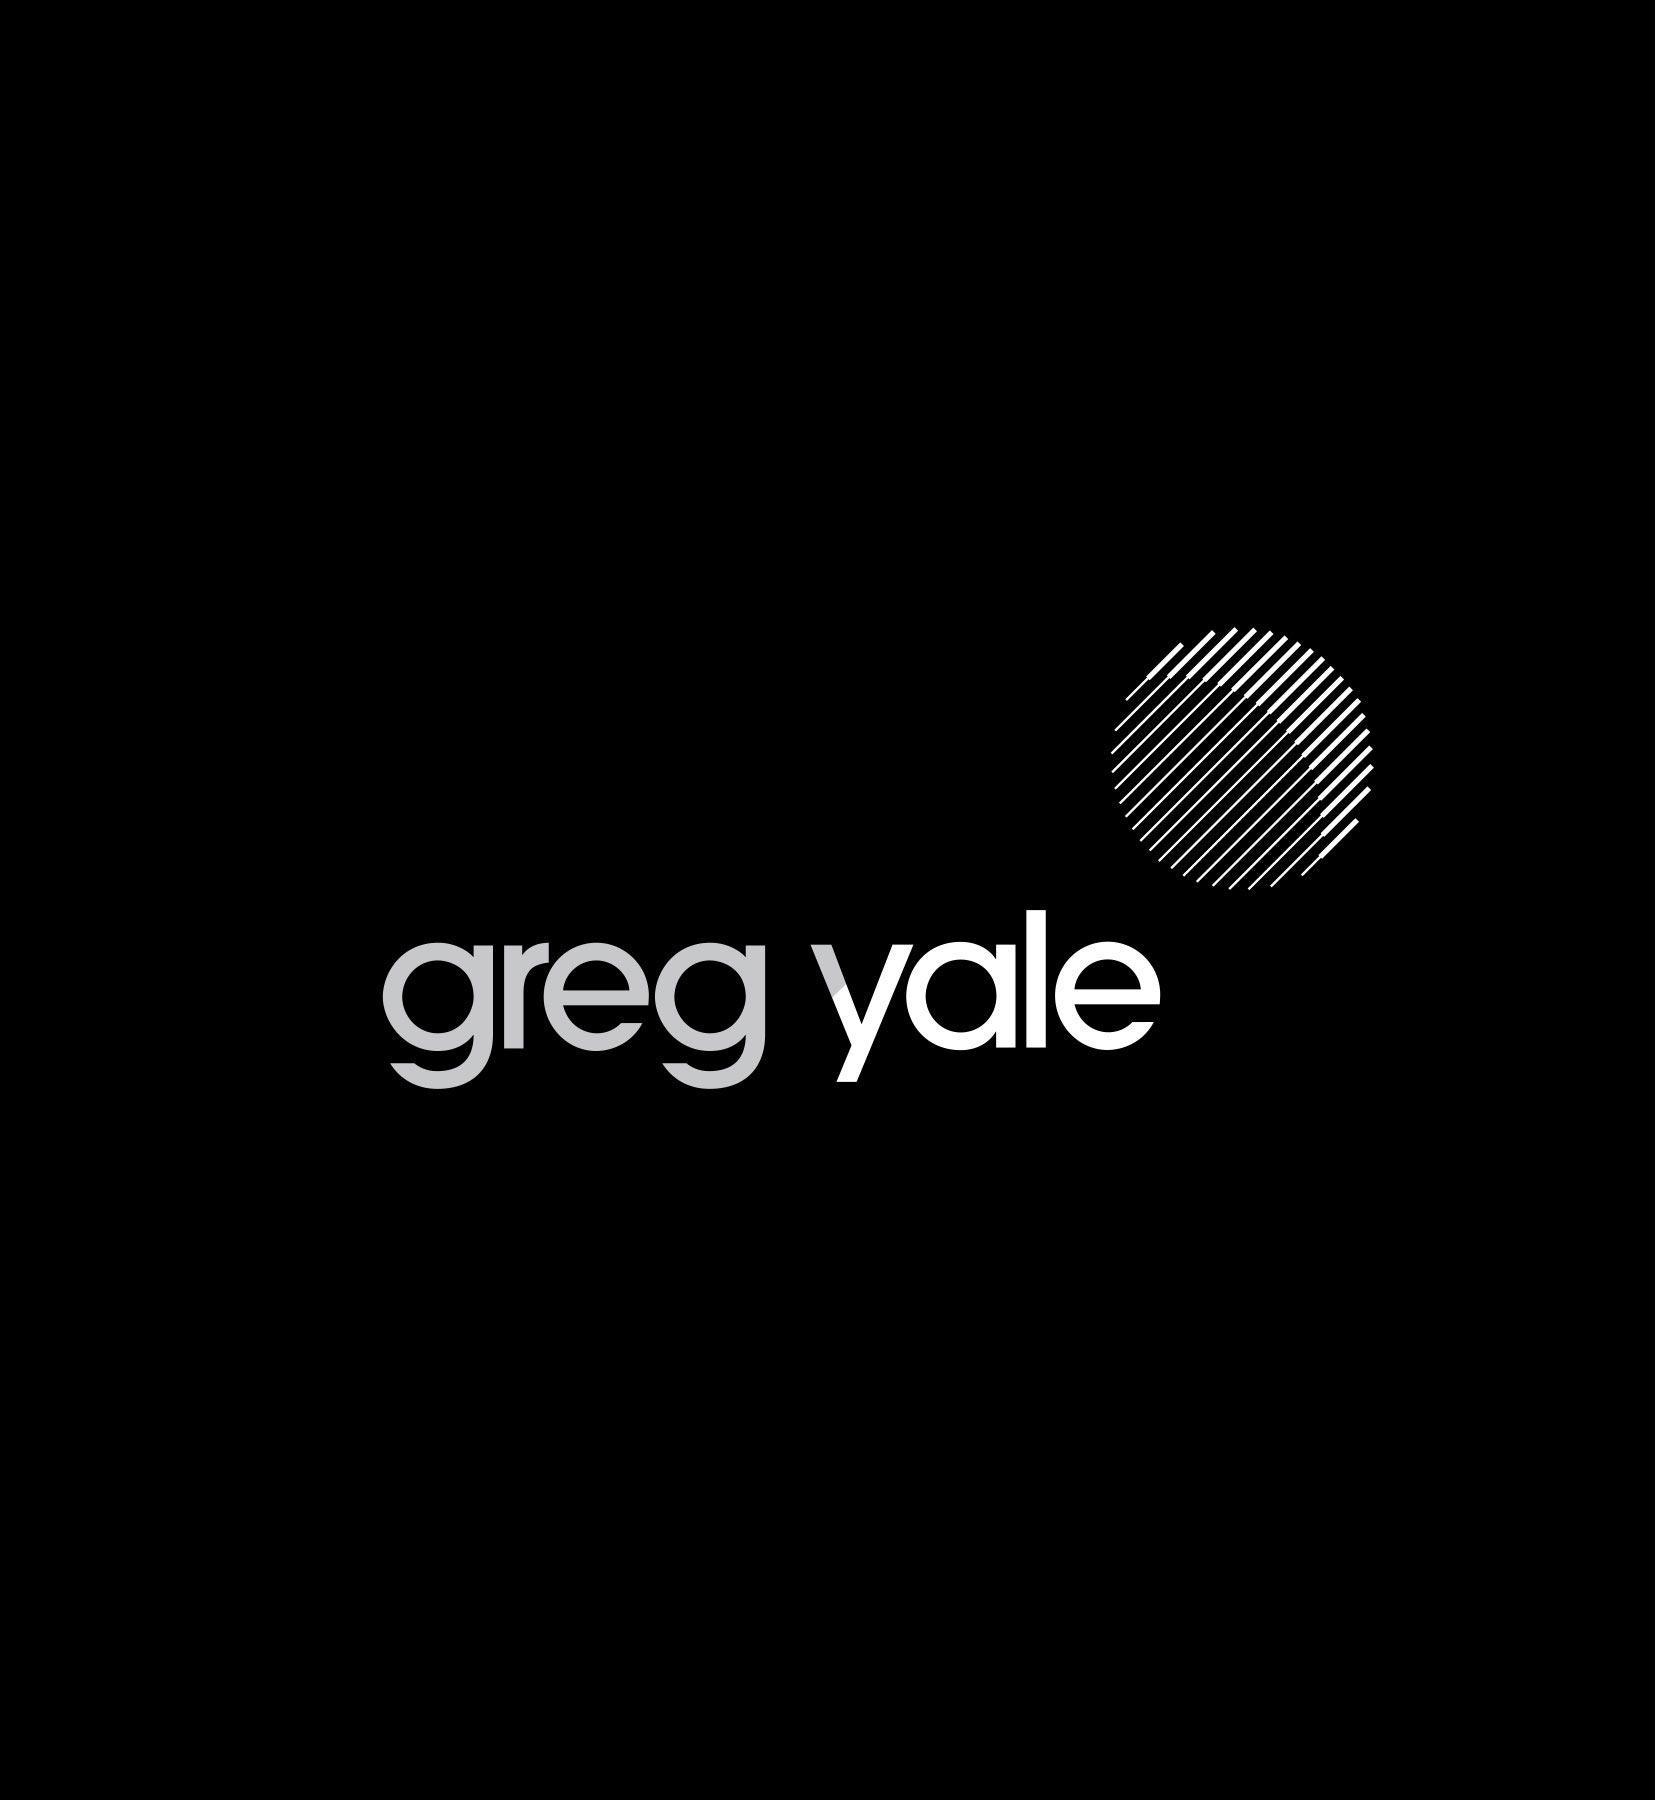 Greg Yale